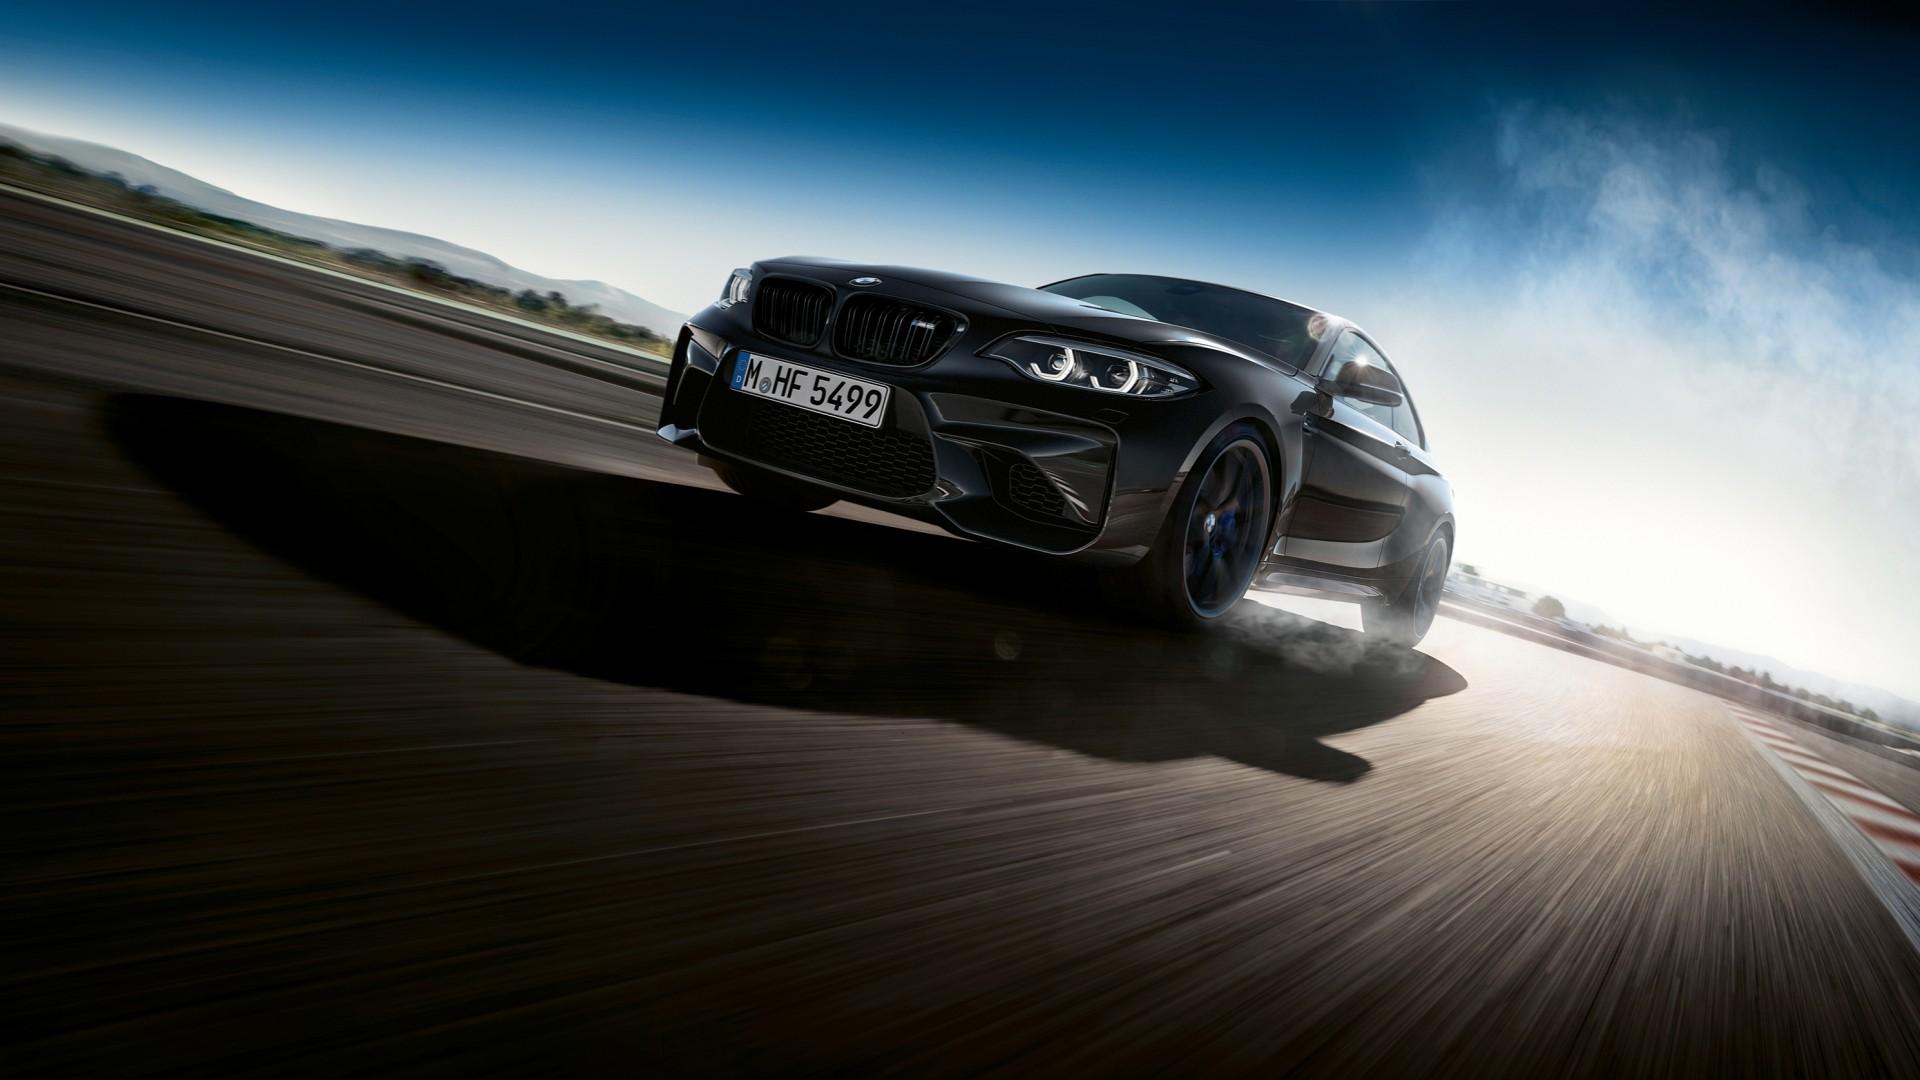 2018 BMW M2 Coupe Edition Black Shadow Wallpaper | HD Car ...